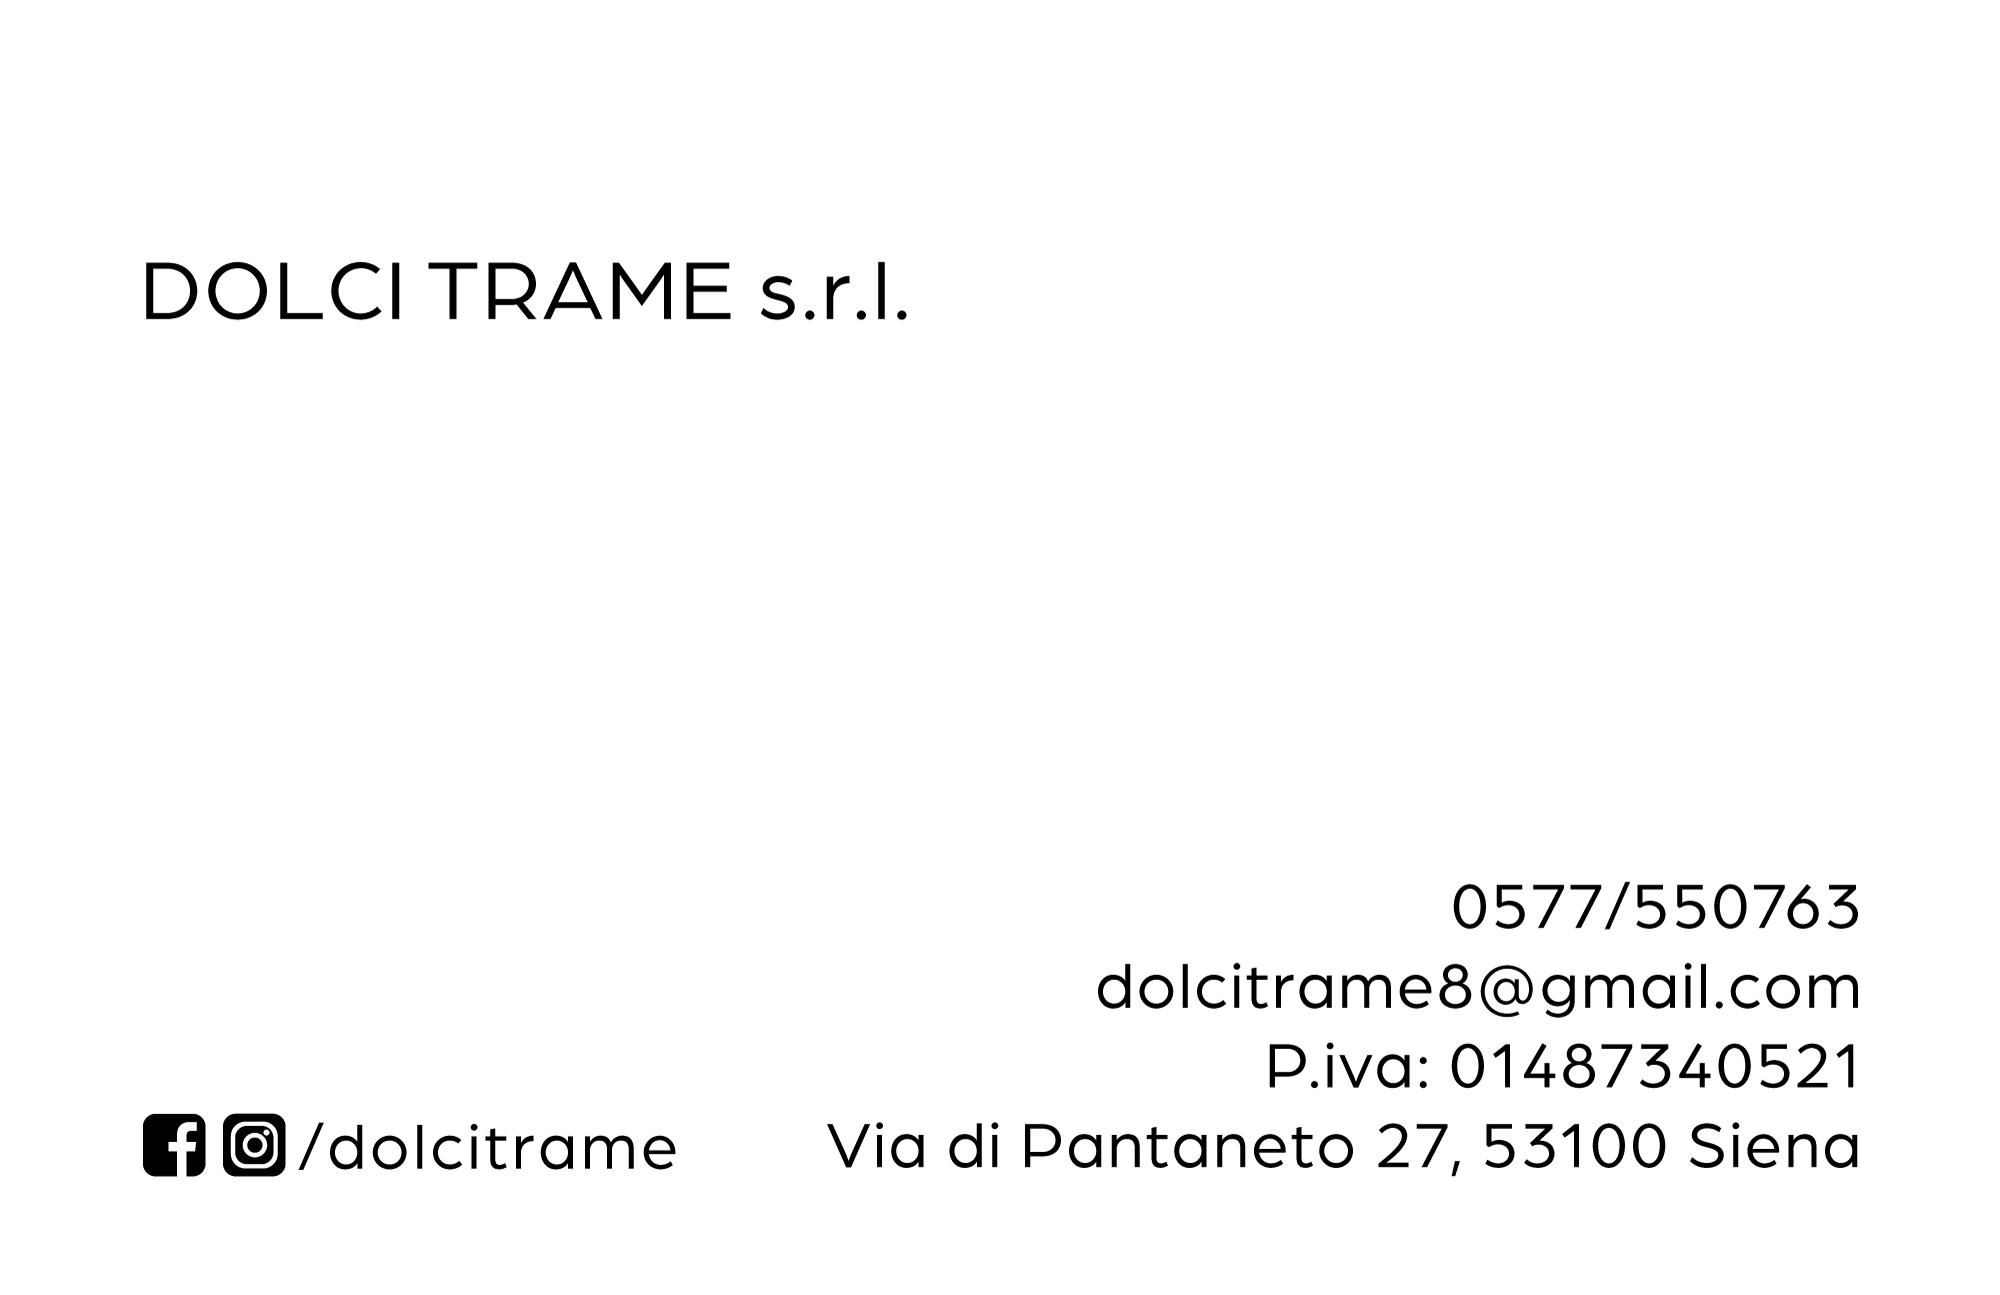 Caratteri-Dolci-Trame_bv_retro